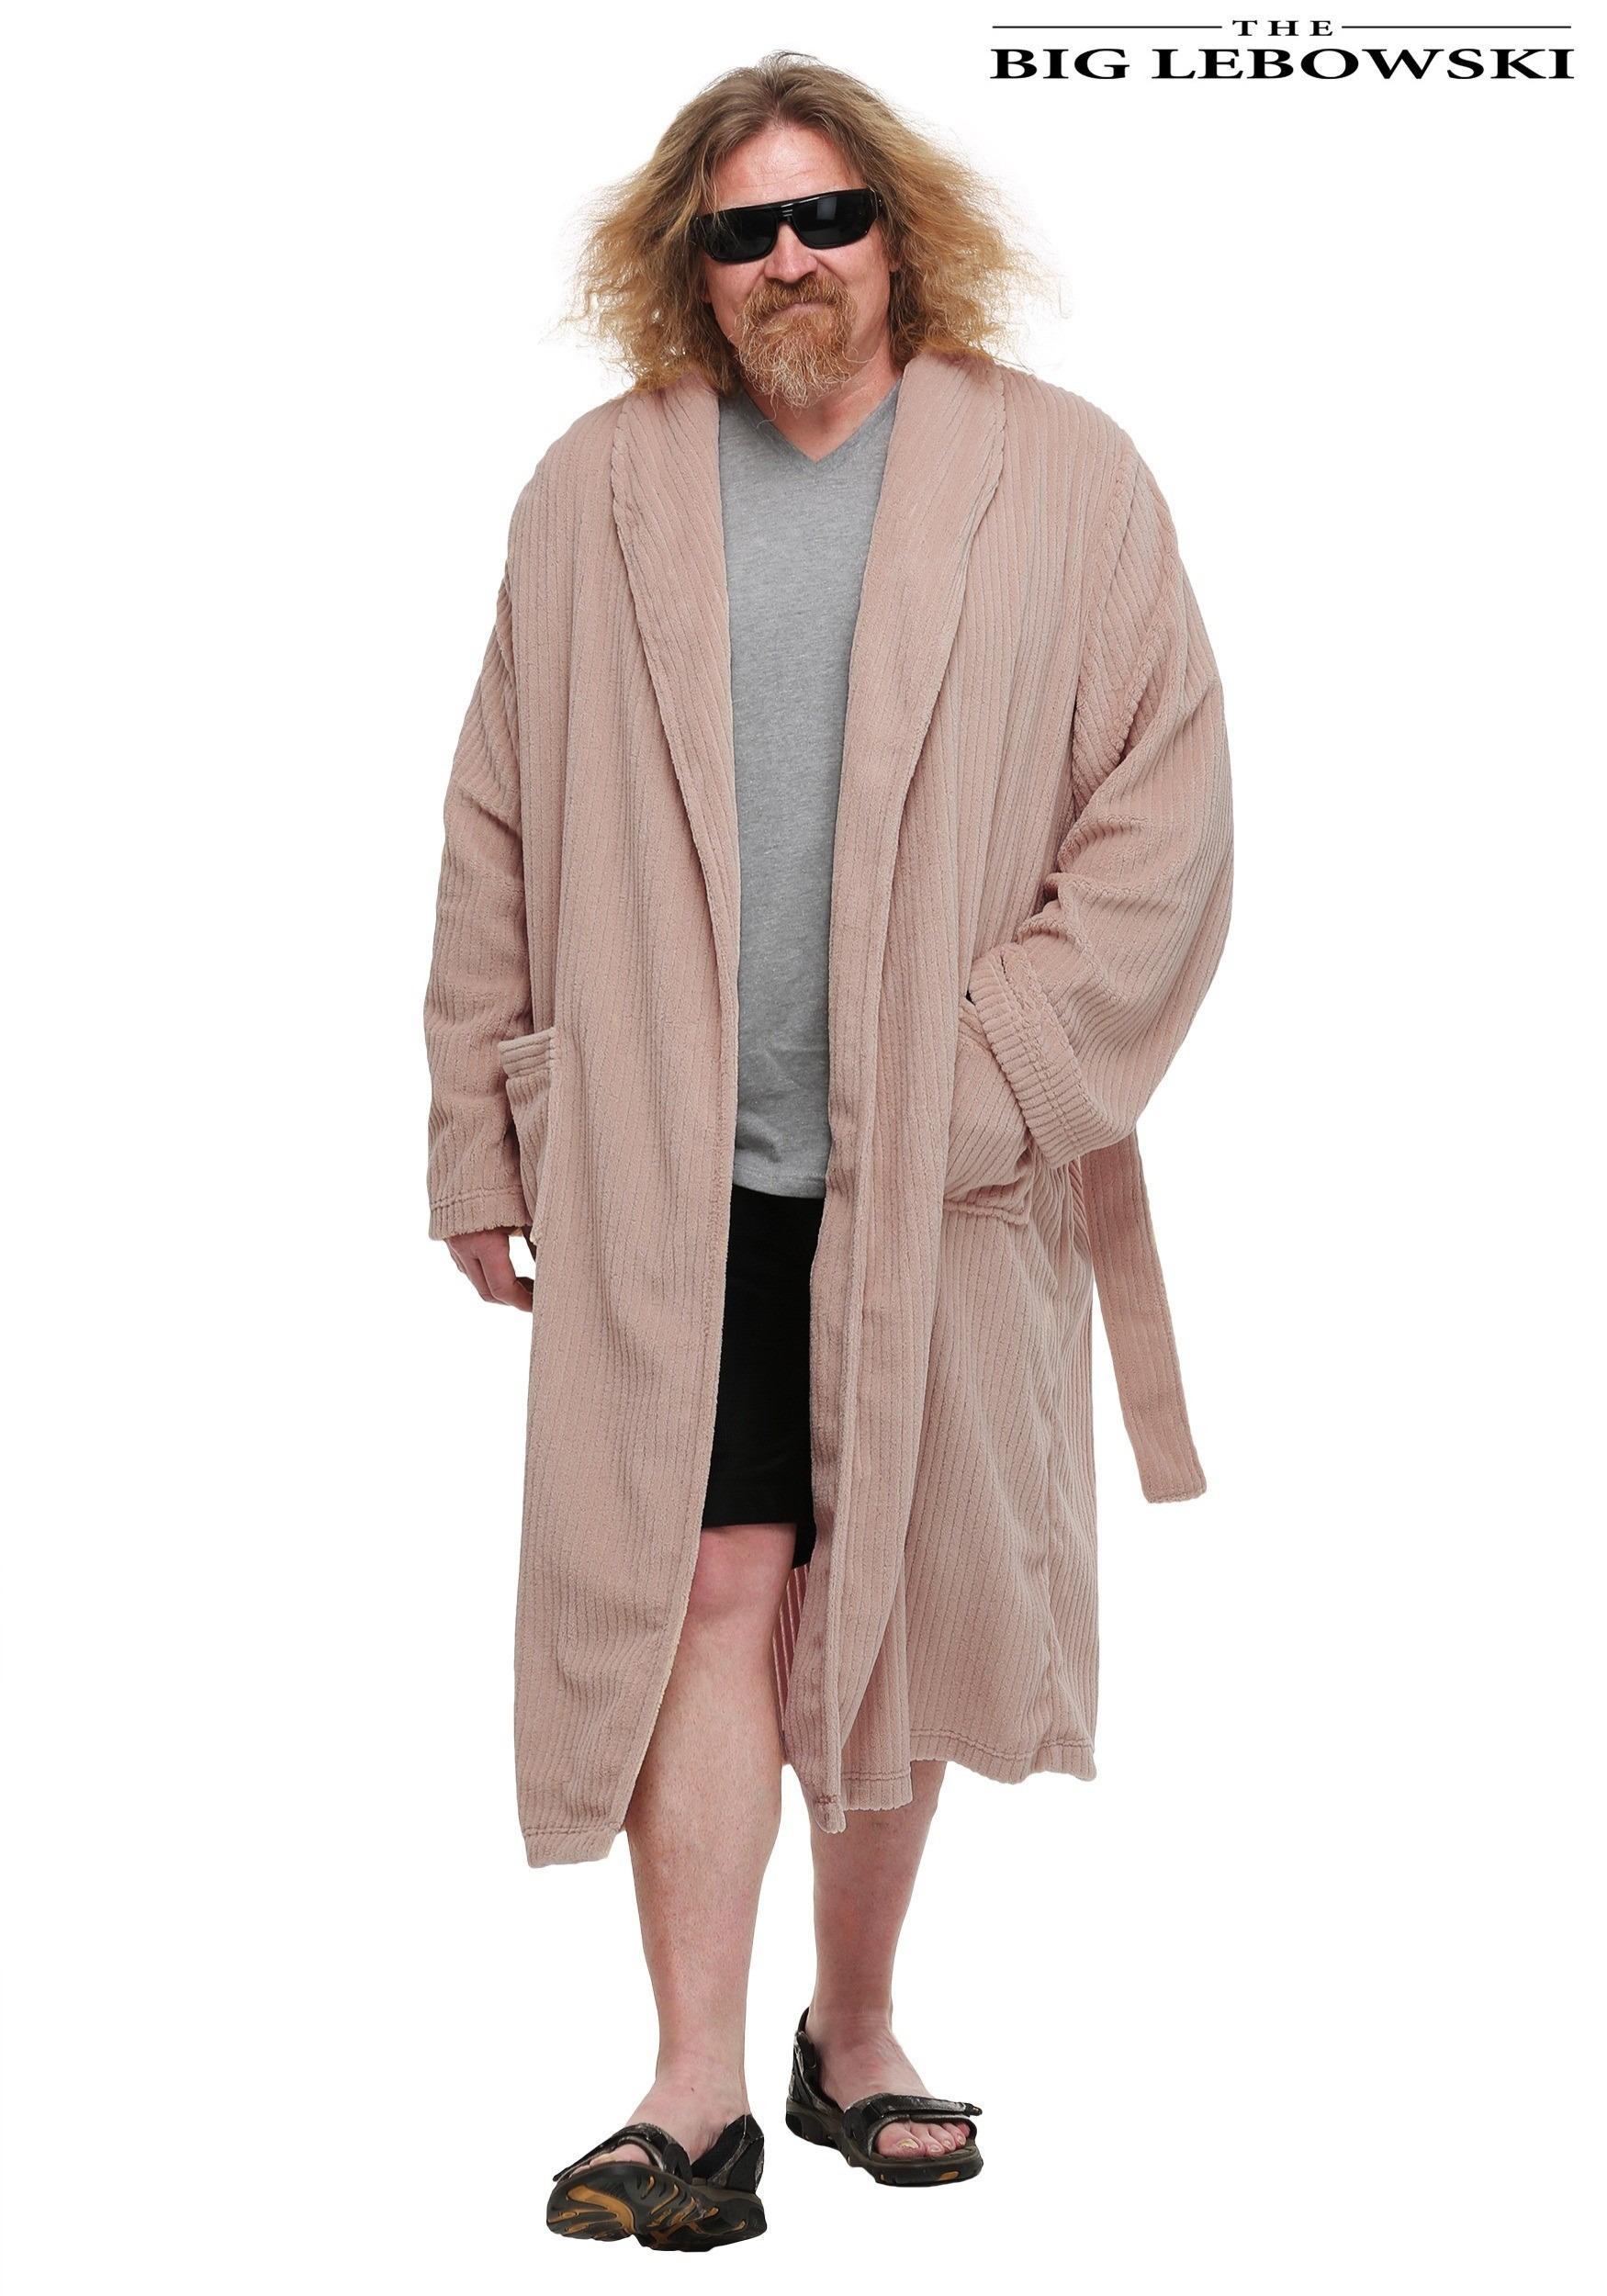 The Big Lebowski The Dude Bathrobe Costume